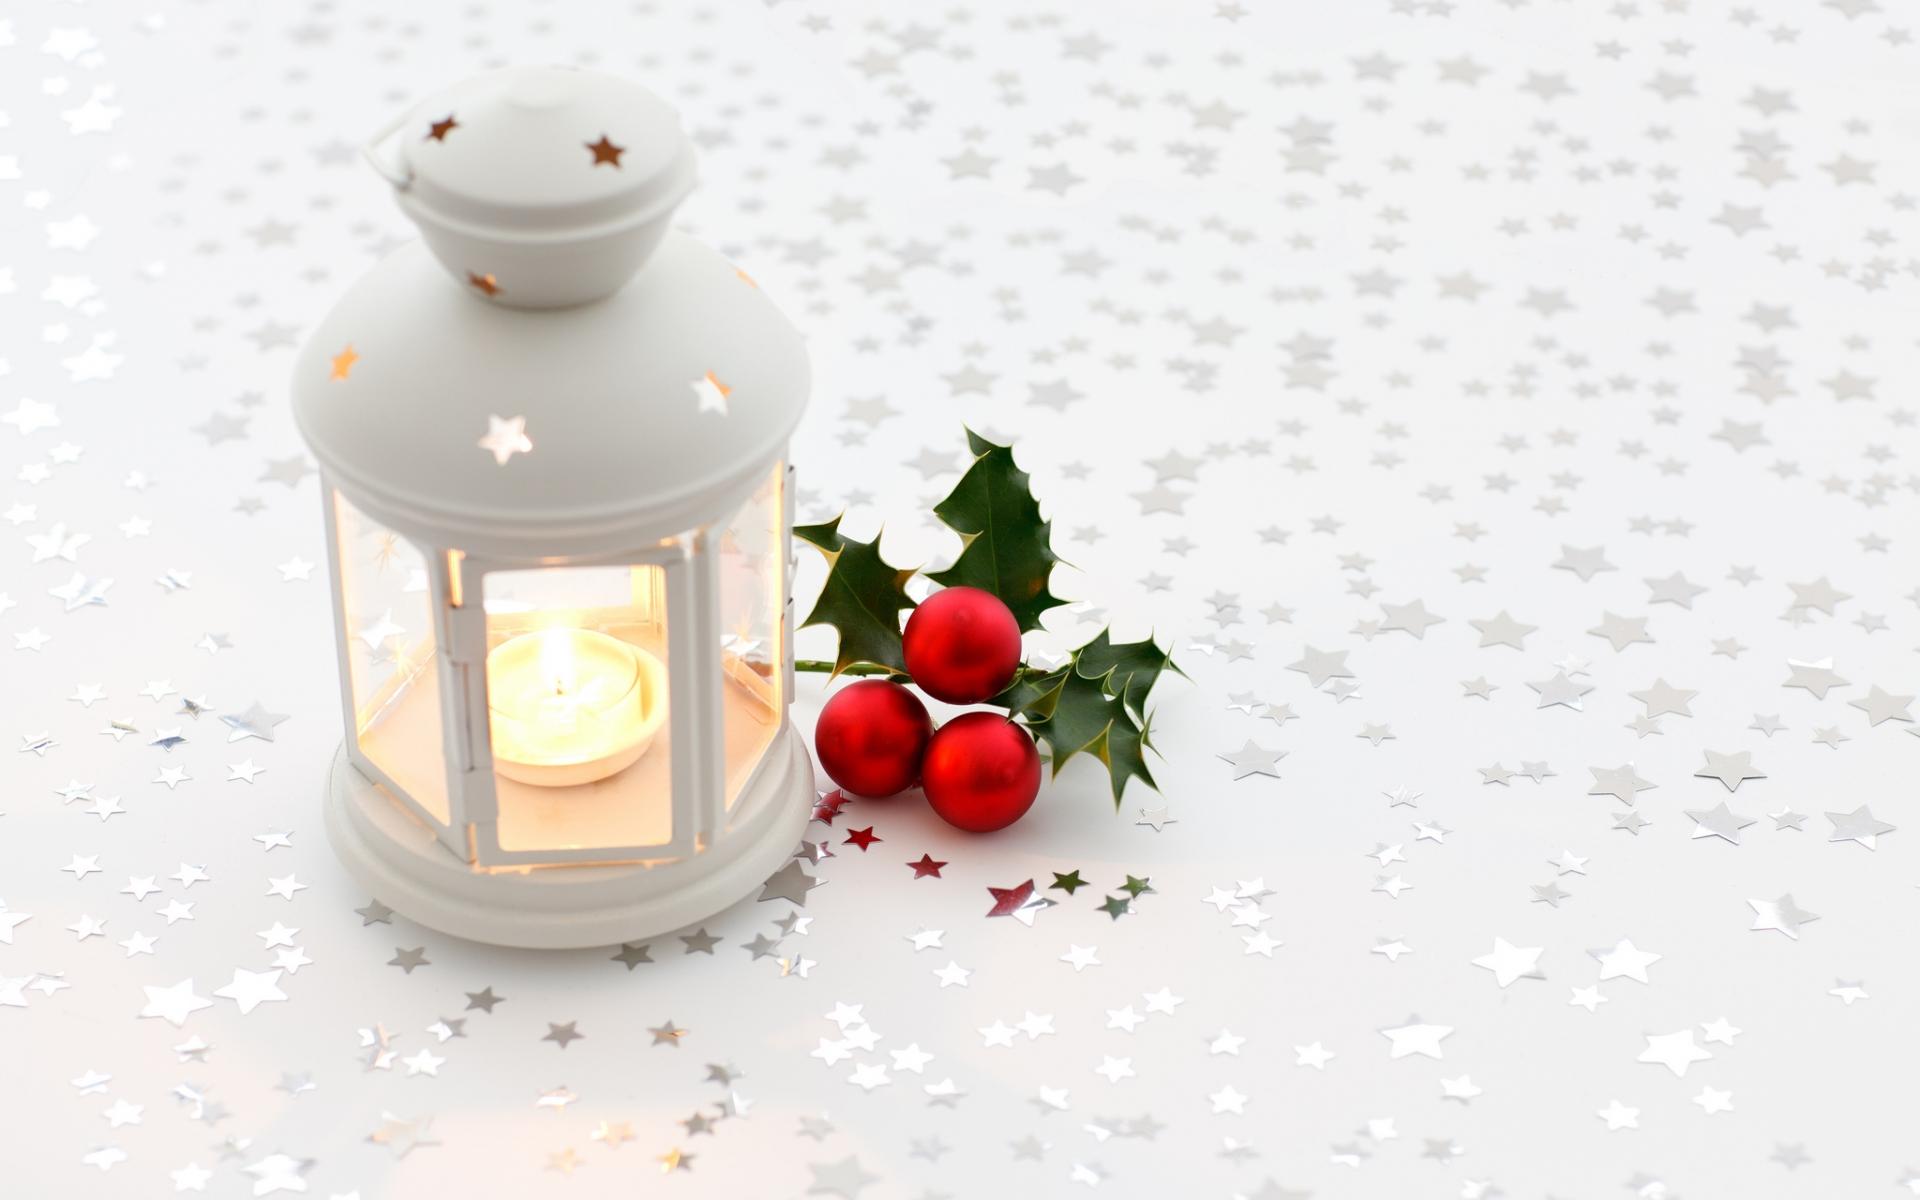 лампа свеча снег рождество lamp candle snow Christmas  № 3982805 бесплатно